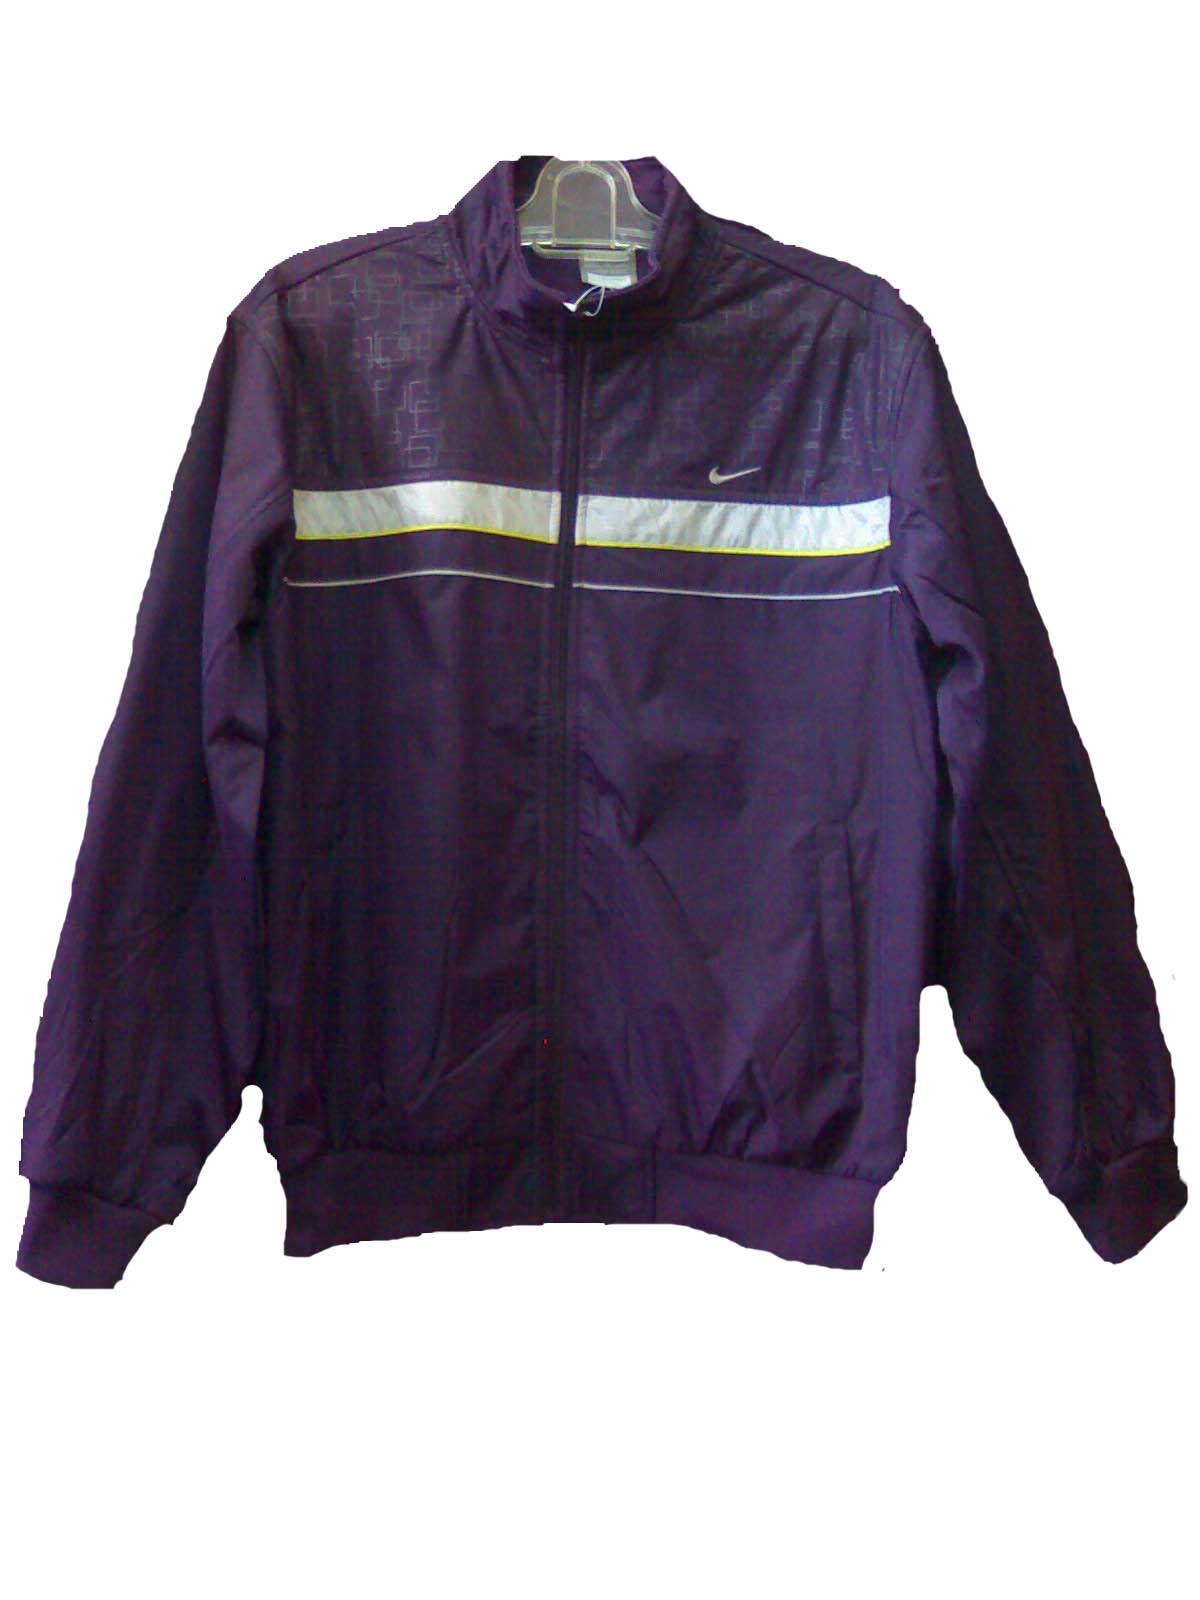 Arif Toko Grosir Jacket Nike Kw Thailand